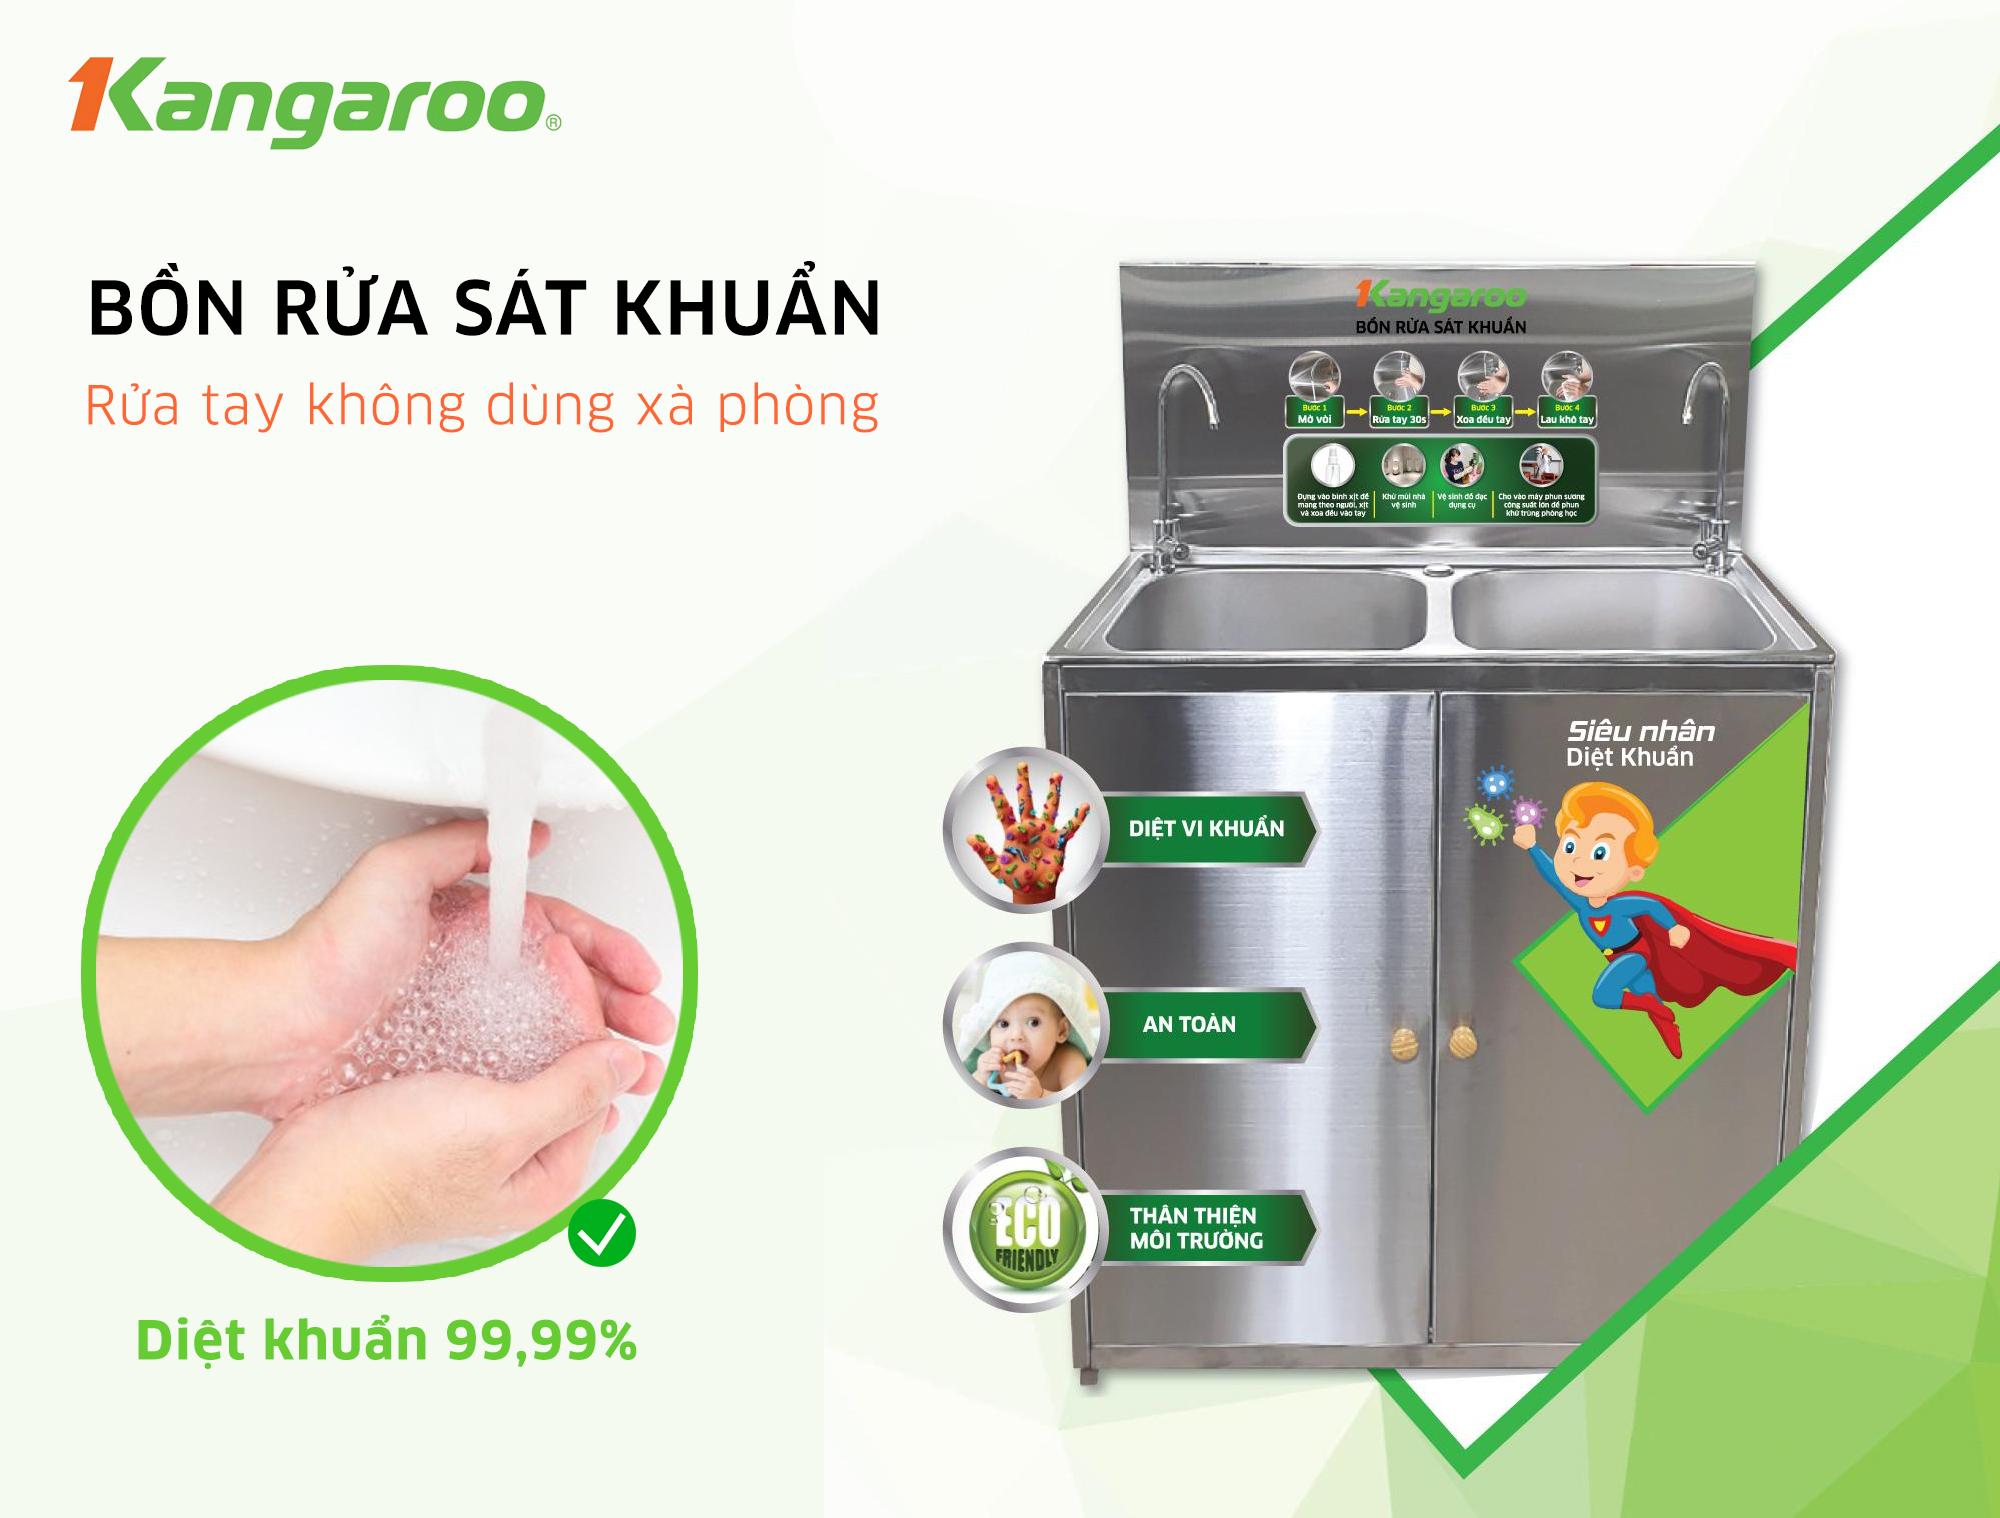 Bồn rửa tay sát khuẩn Kangaroo